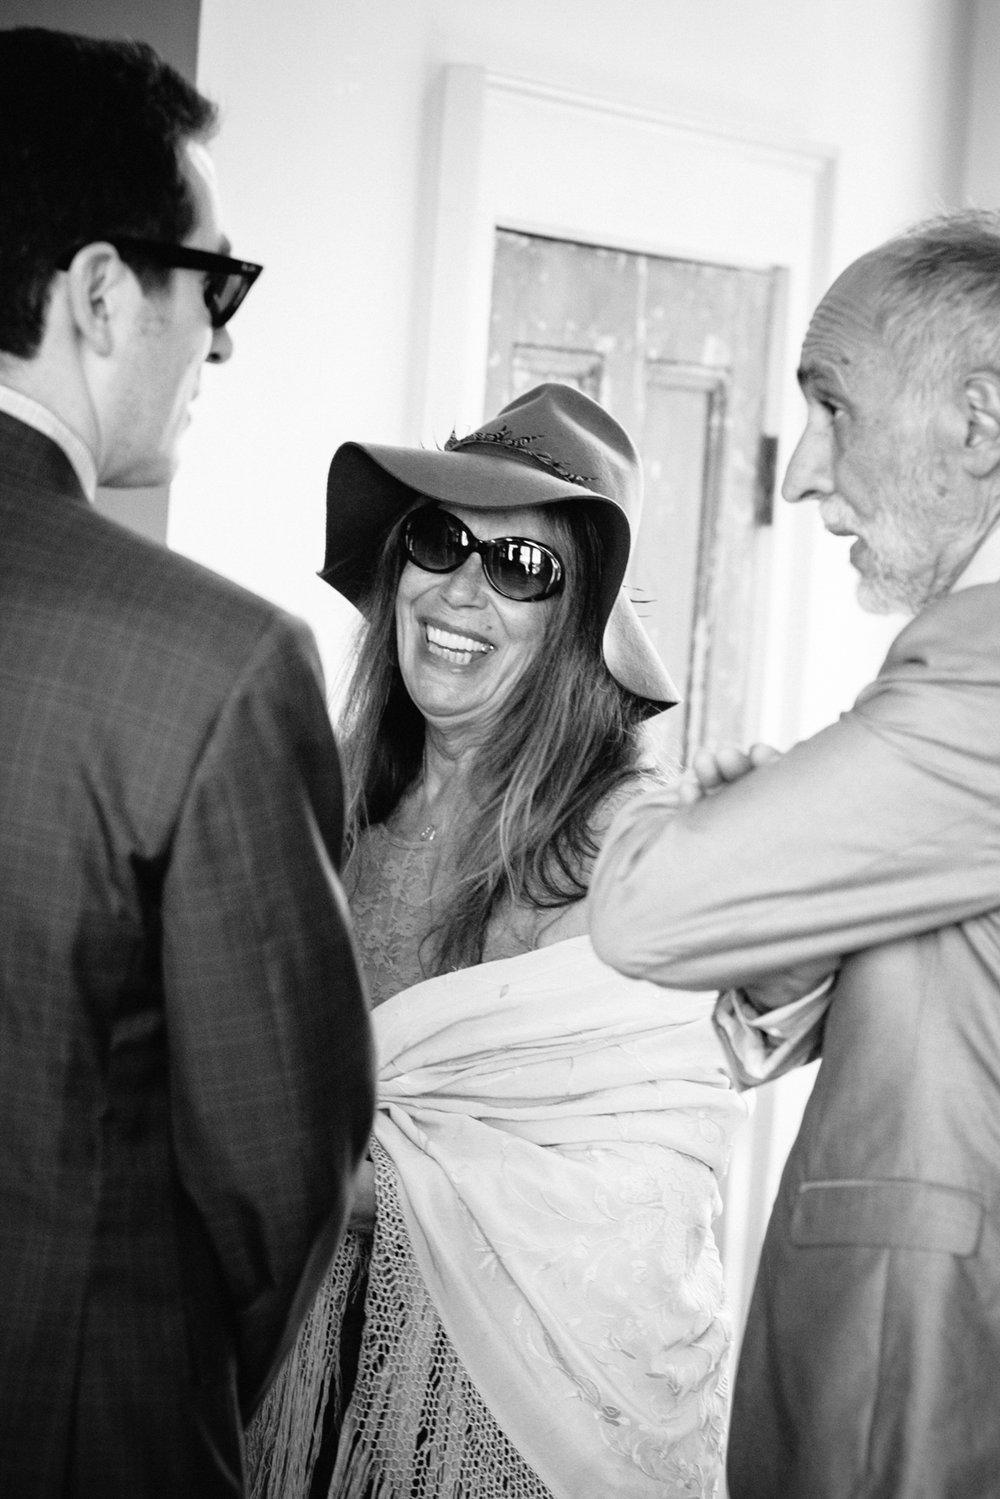 Kimberly-Coccagnia-Wedding-Photographer-27.JPG